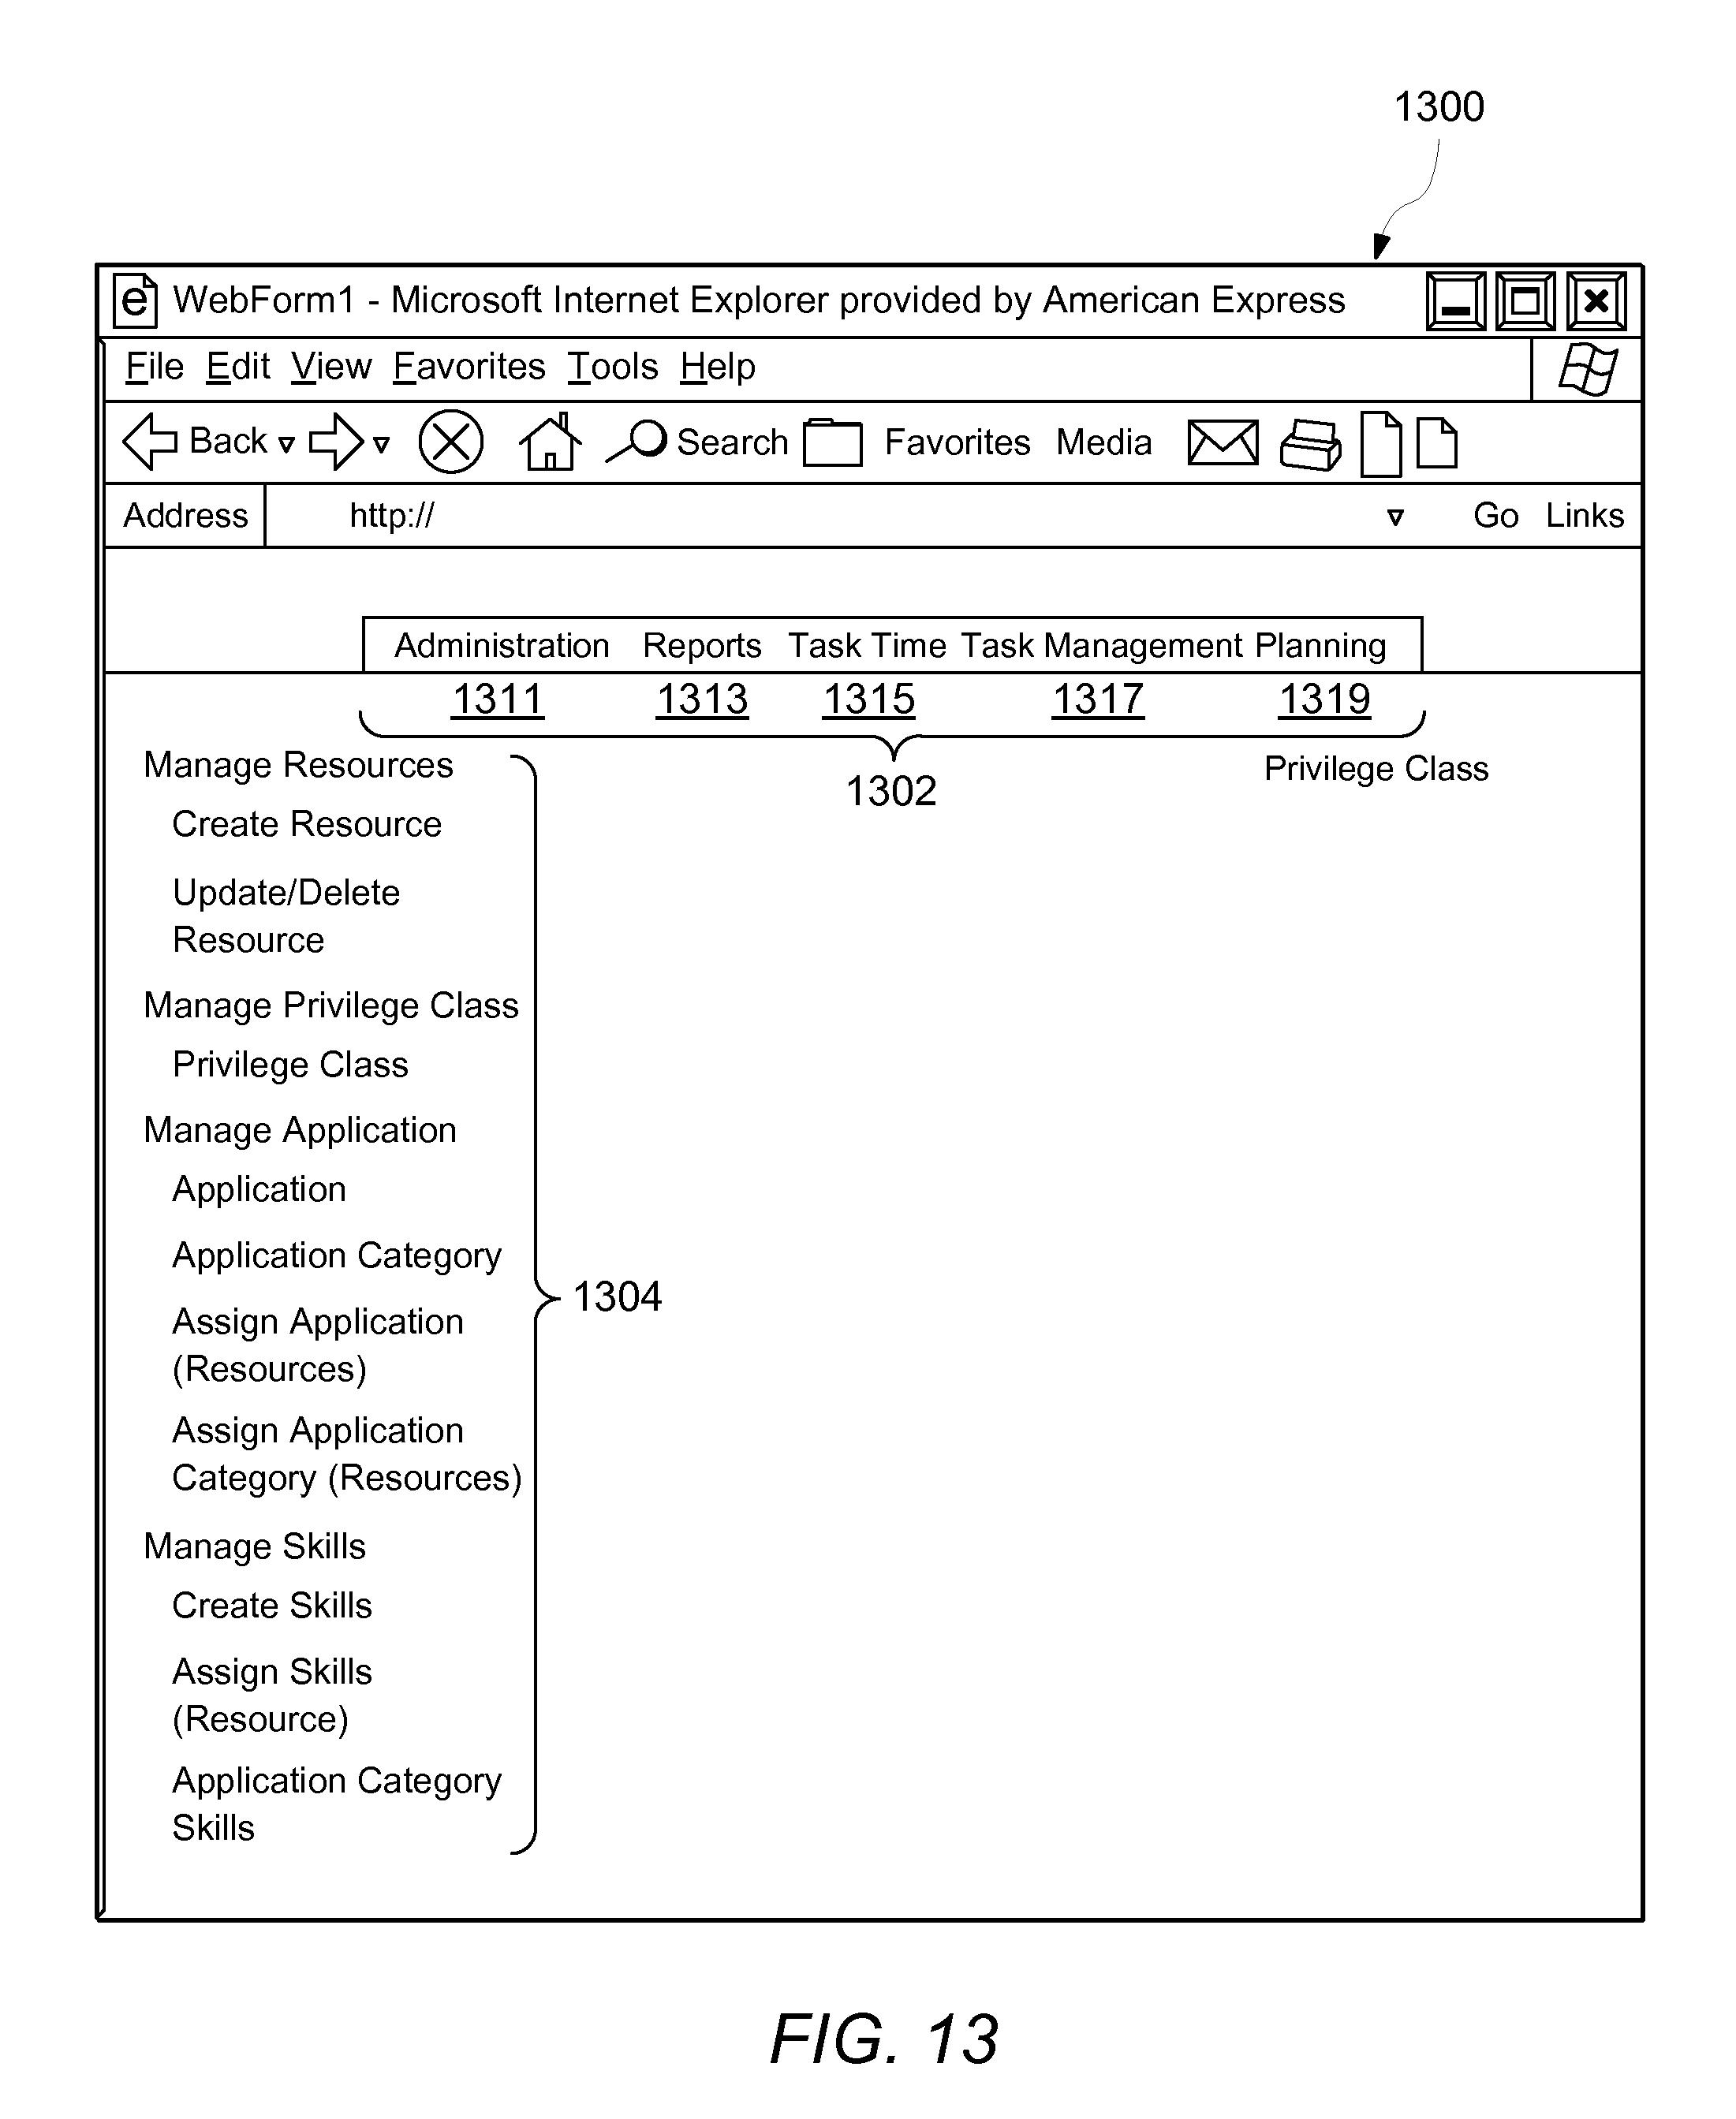 Patent US 7,694,876 B2